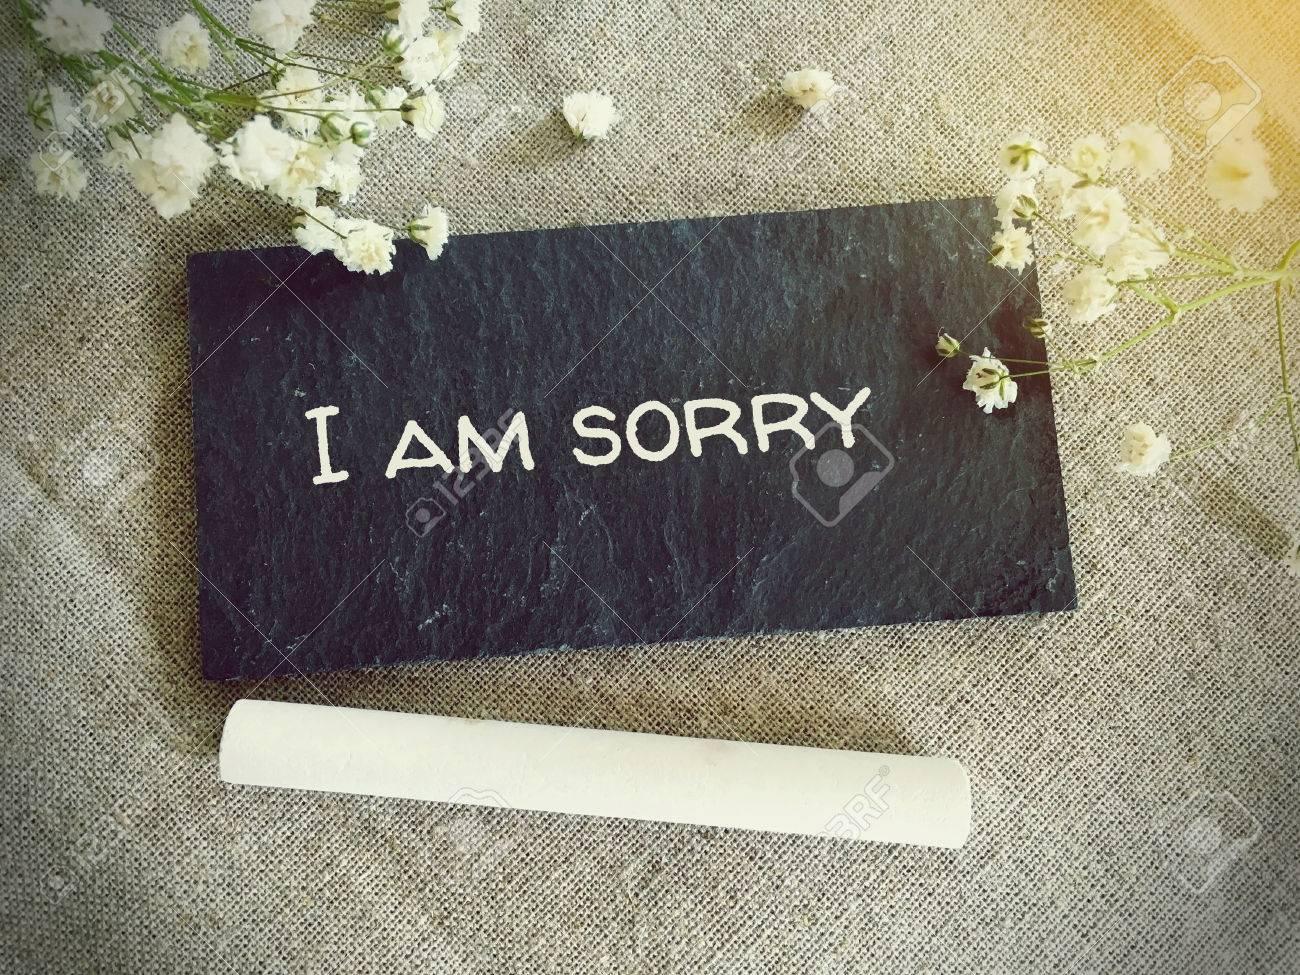 Es mir leid bilder tut sorry 32 Bilder